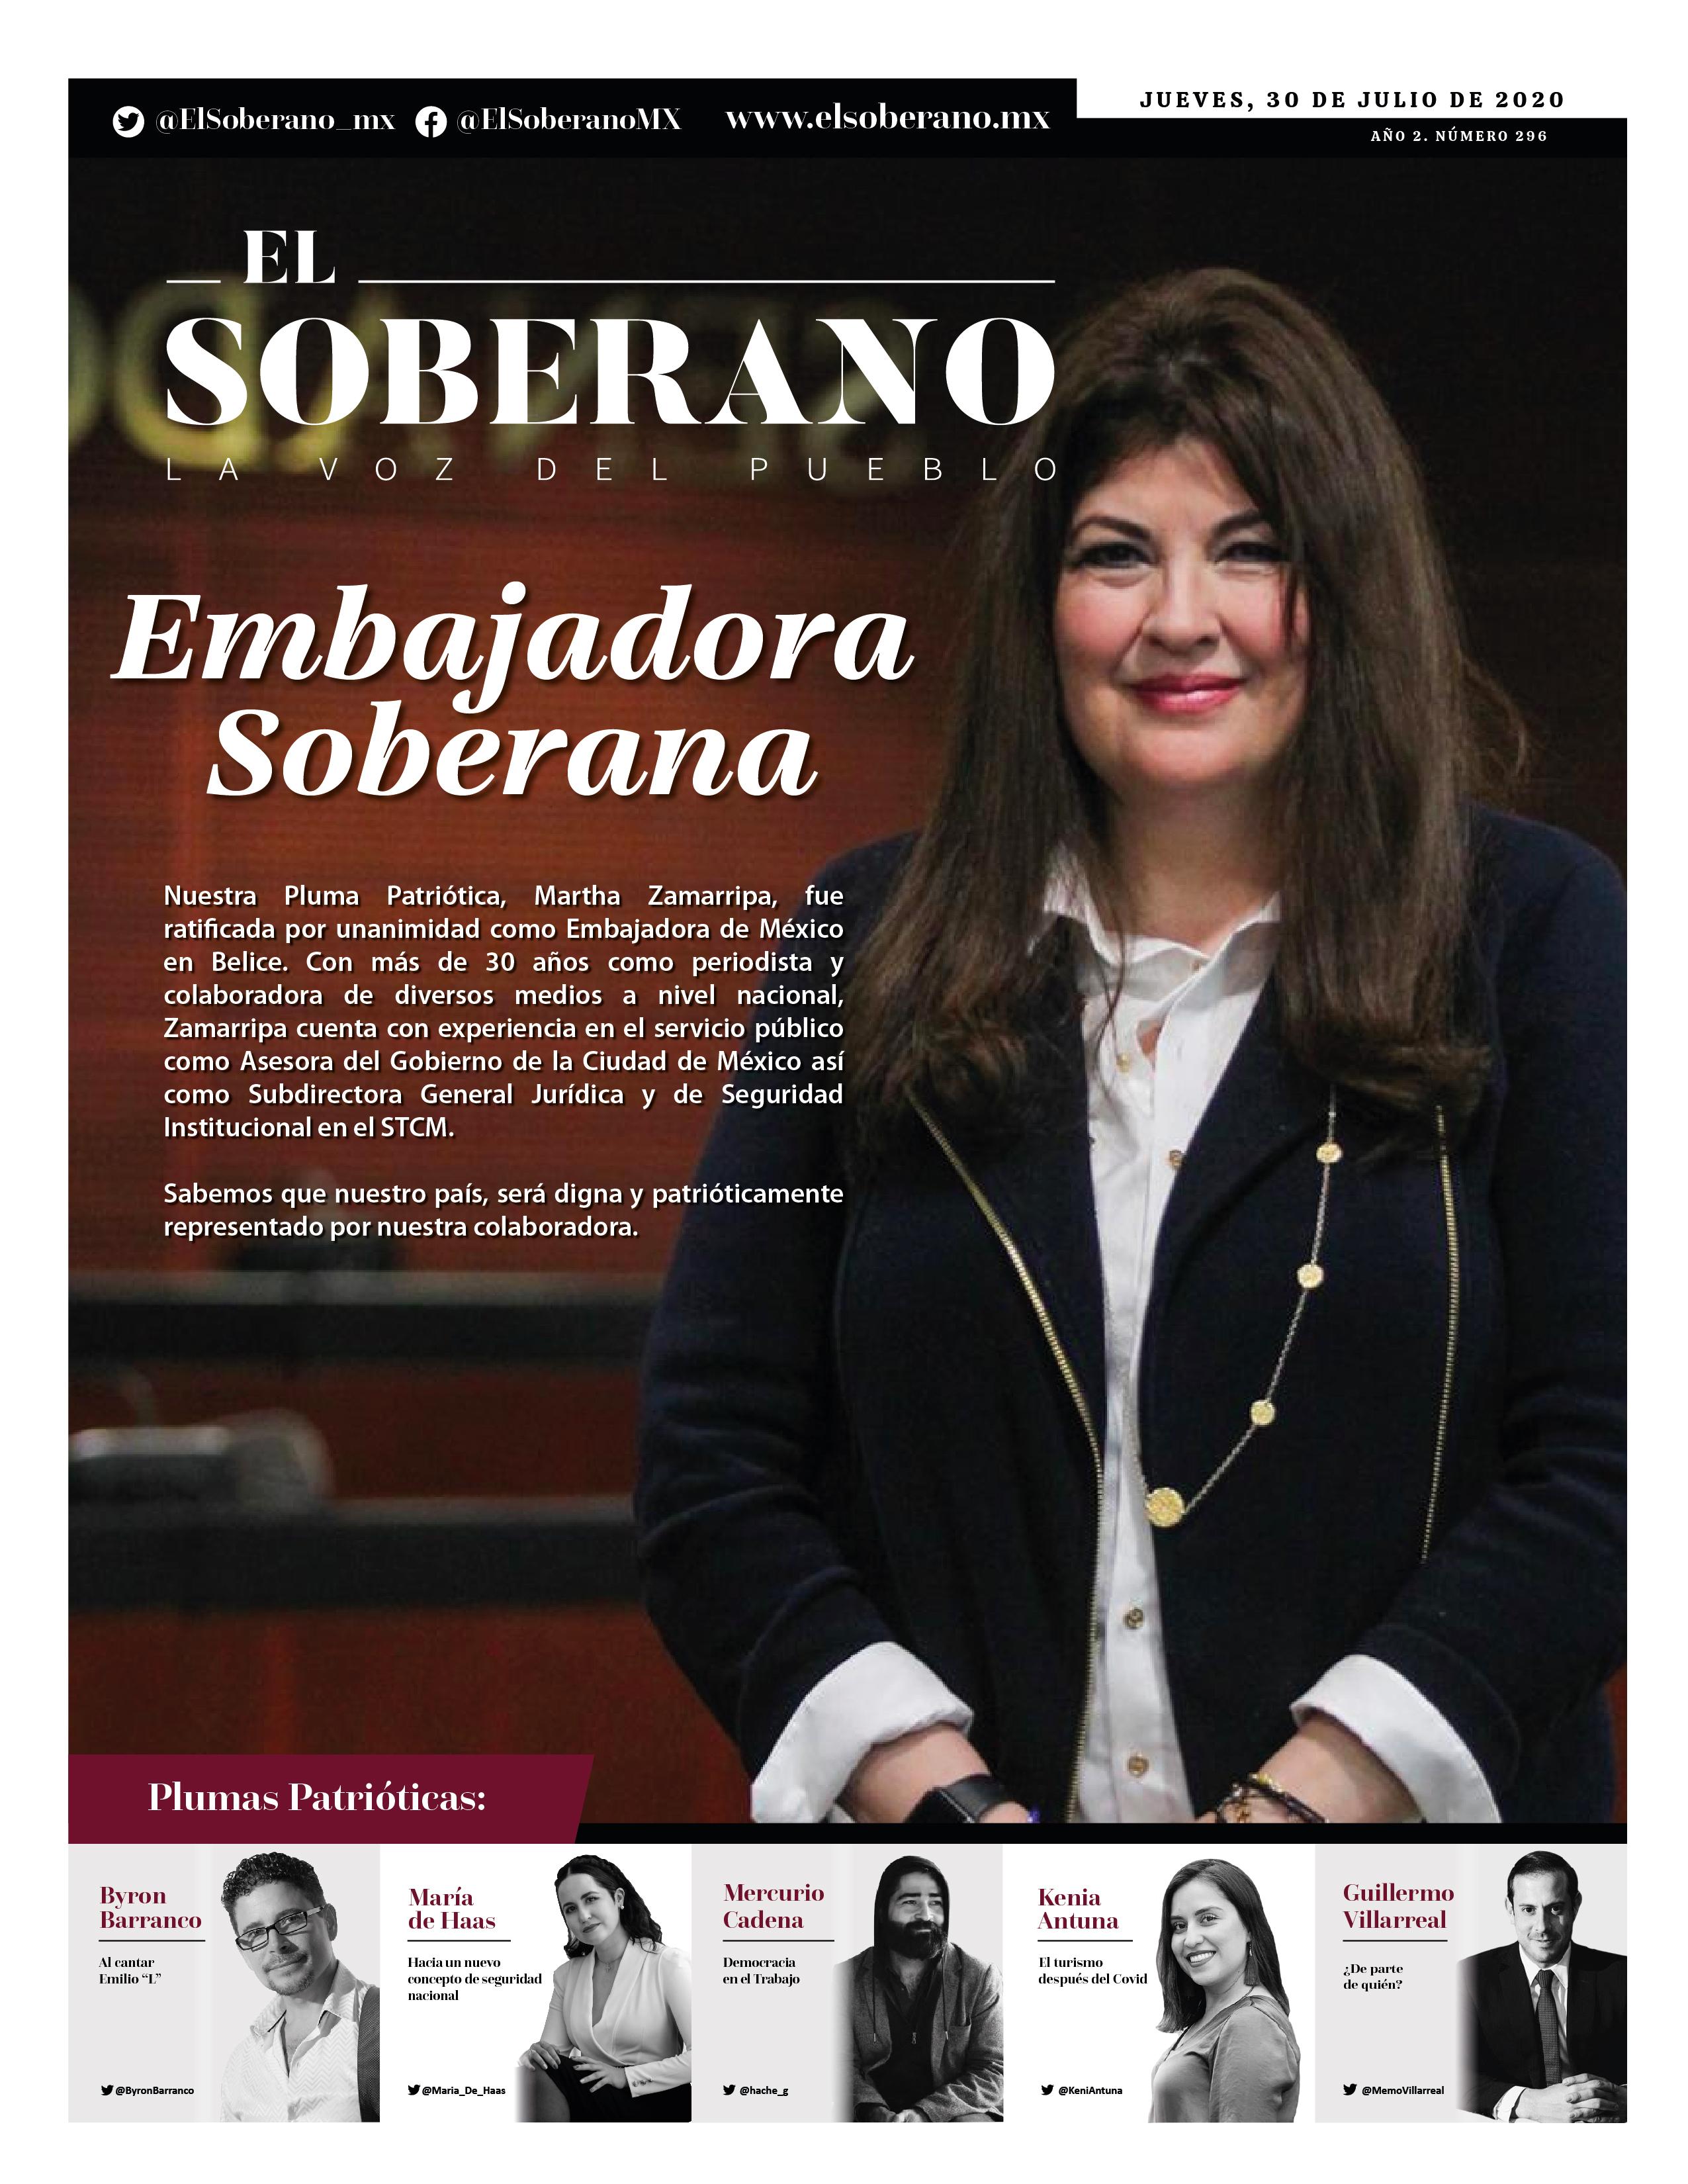 Embajadora Soberana